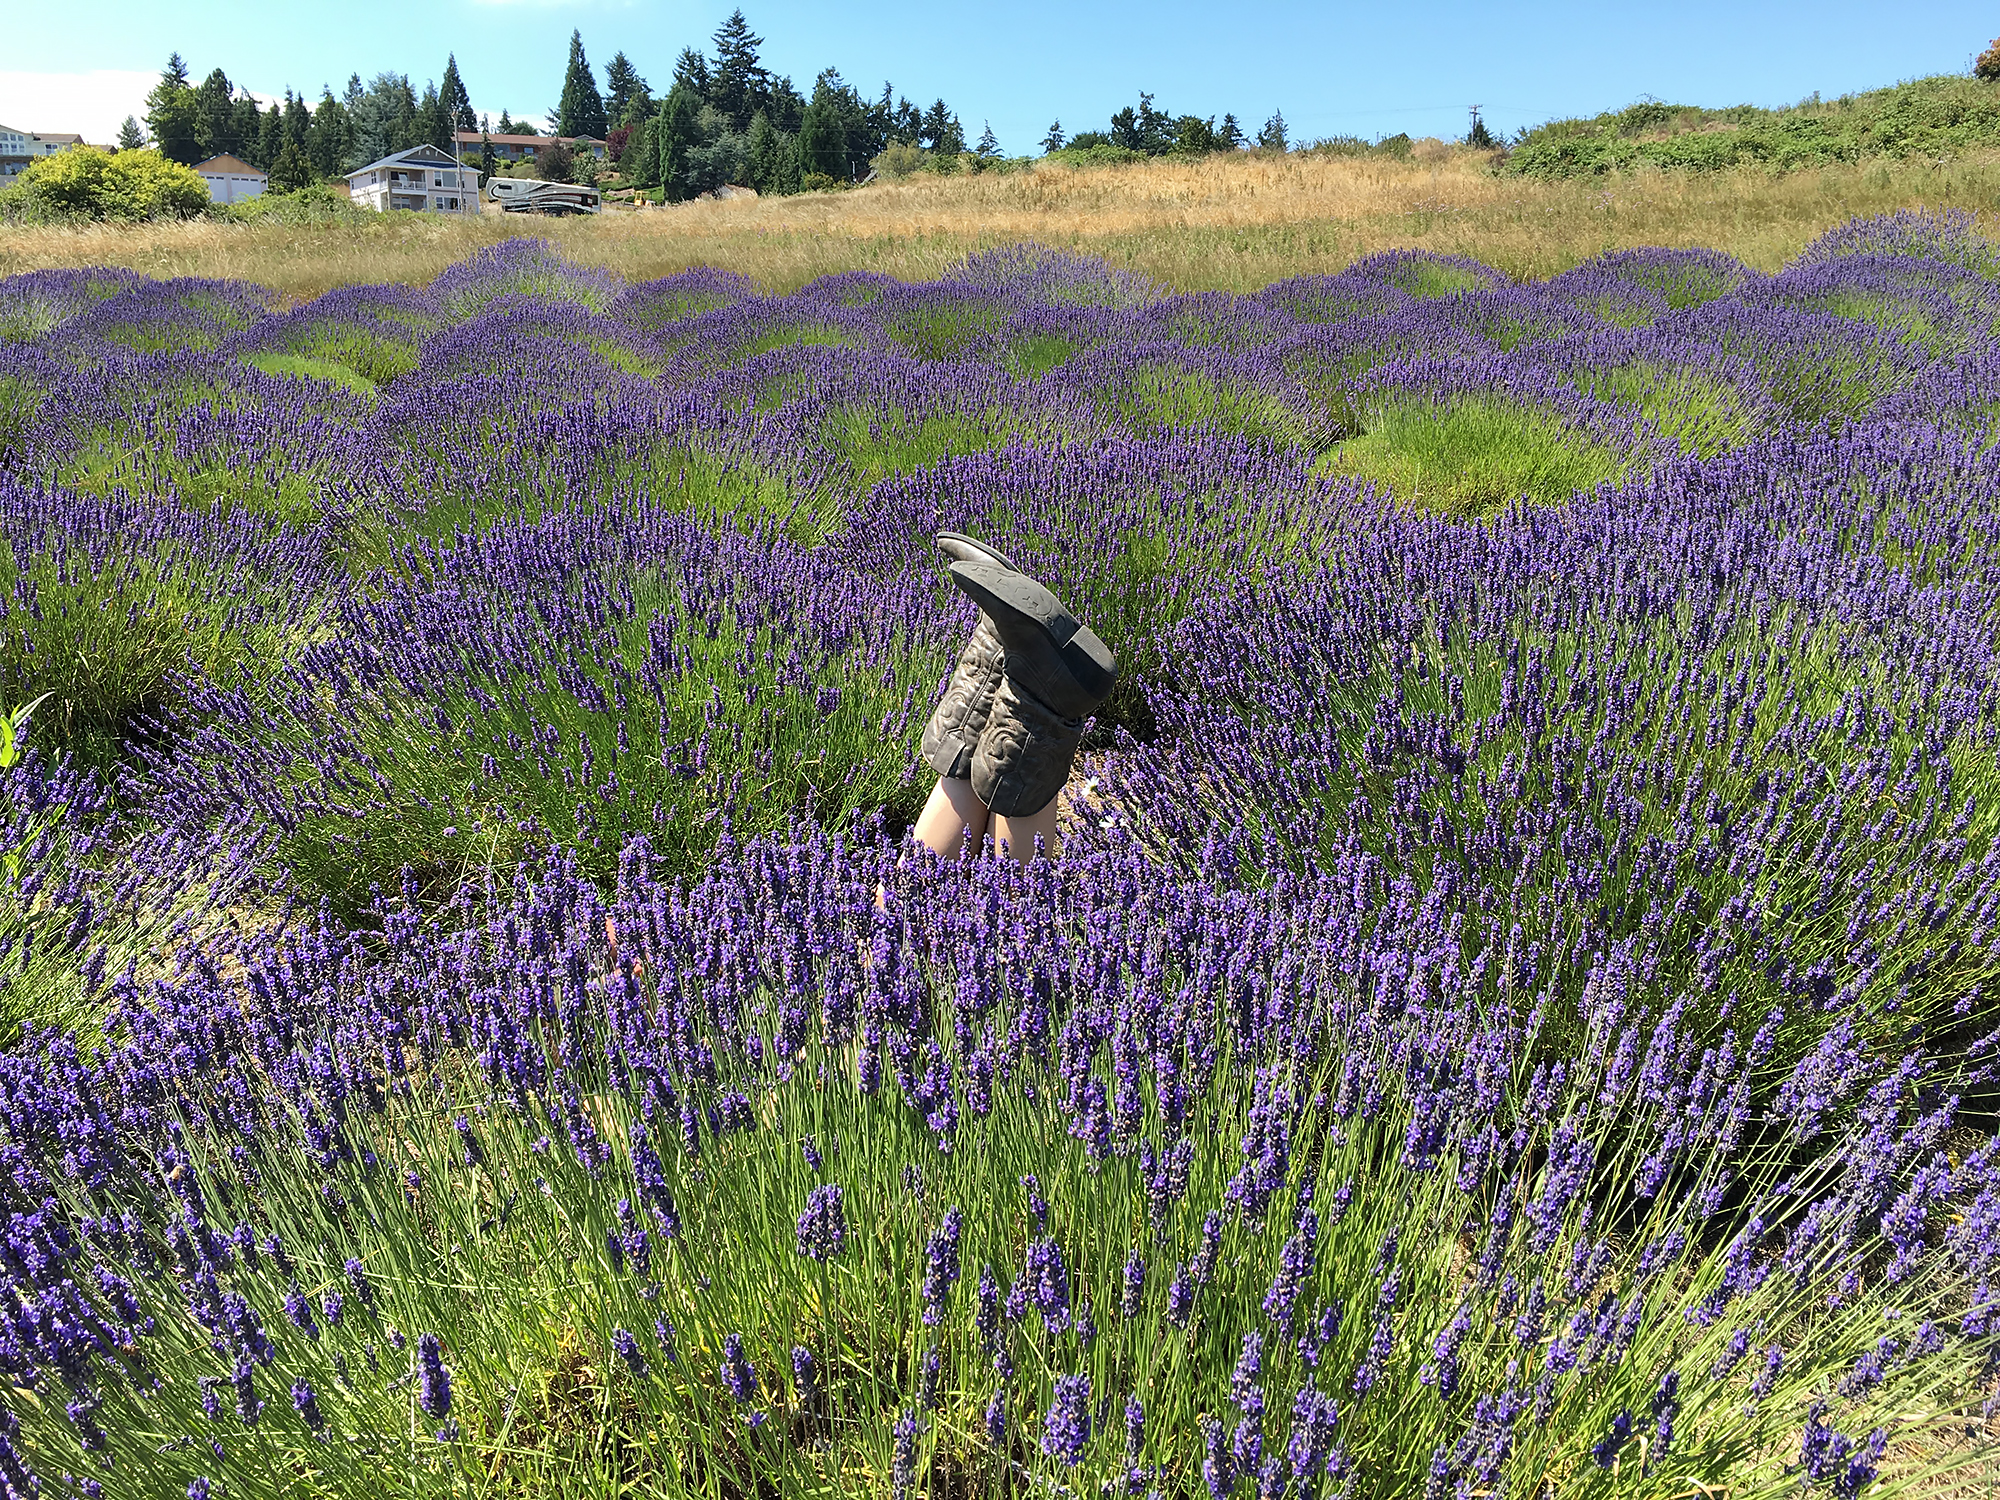 The lavendar farms of Sequim, Washington